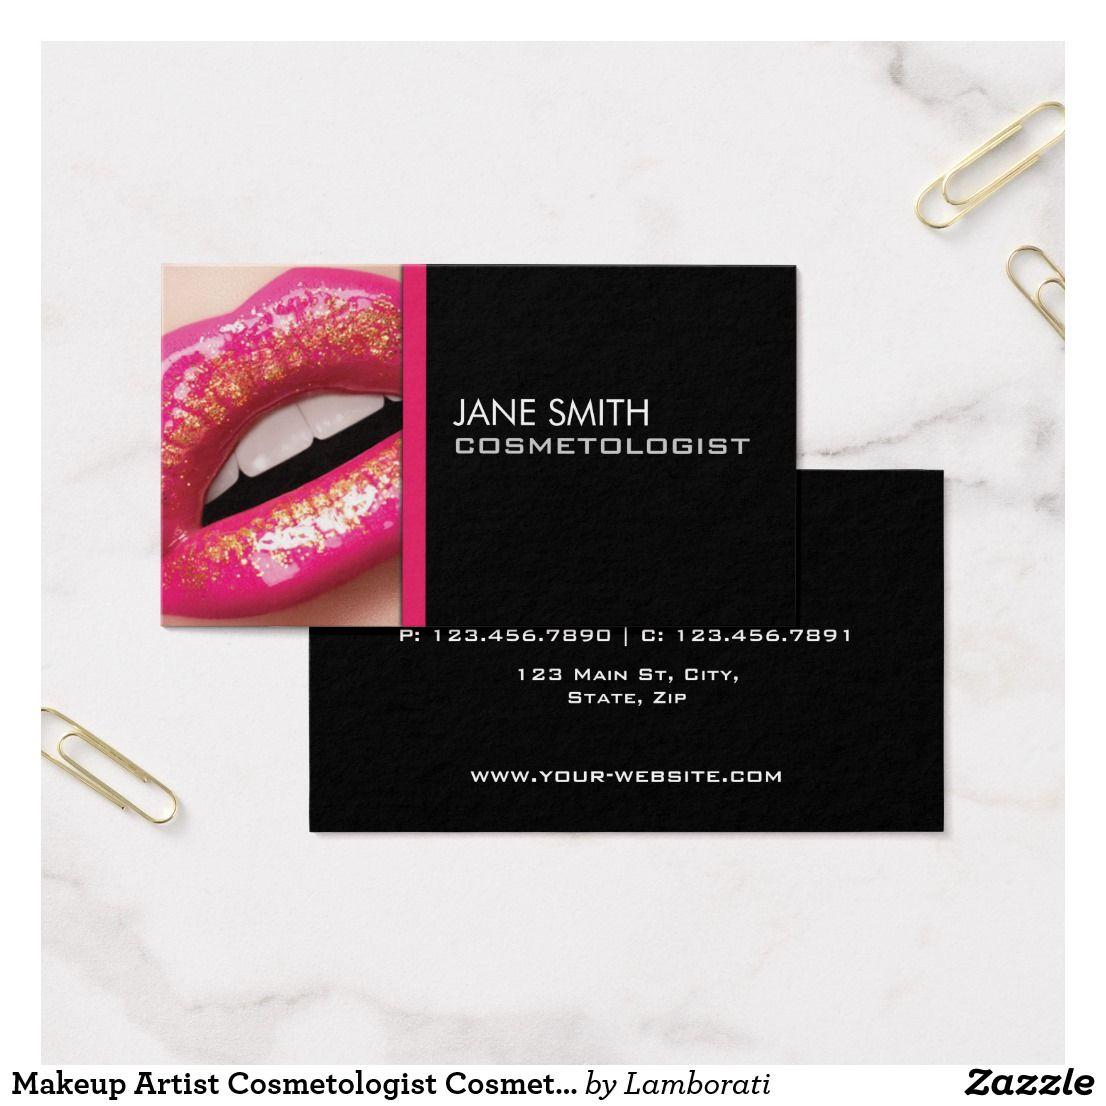 Makeup Artist Cosmetologist Cosmetology Groupon Business Card ...